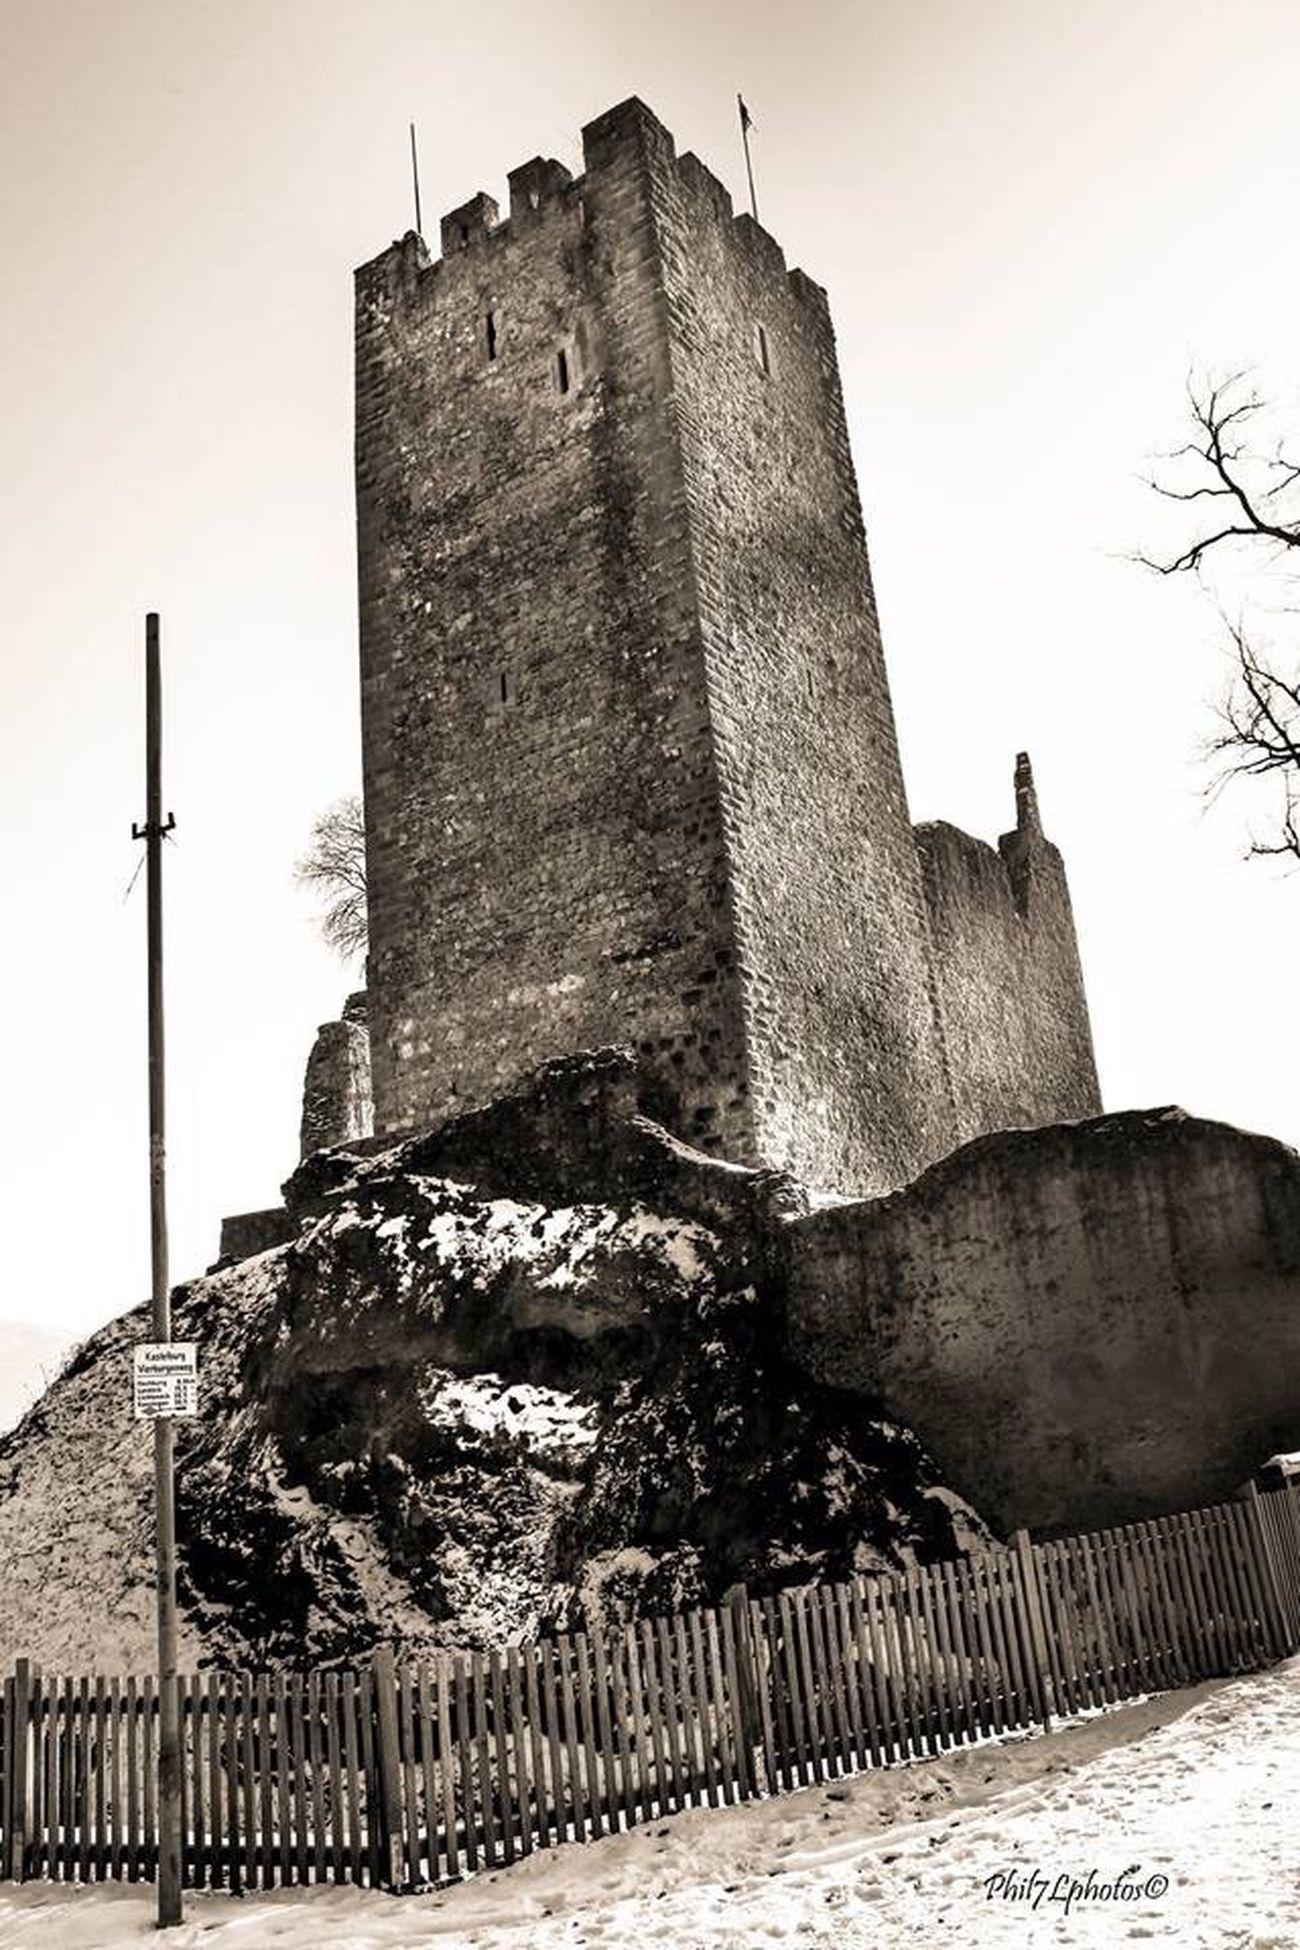 Waldkirch Kastelburg Monochrome Turm Burg Ruine Ruins Taking Photos